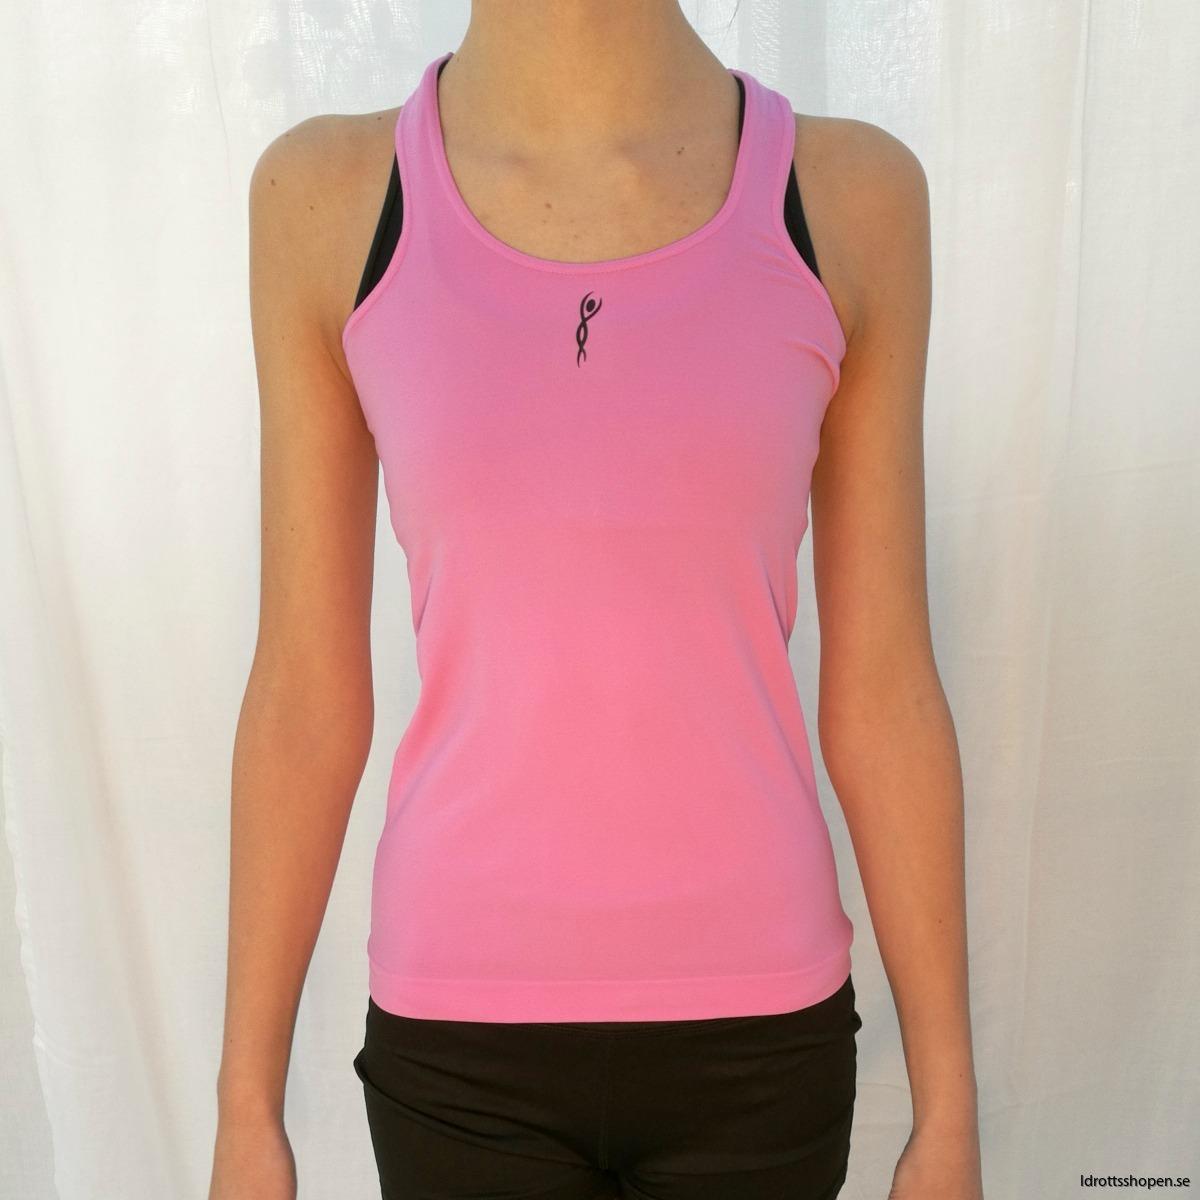 Venturelli linne neonrosa